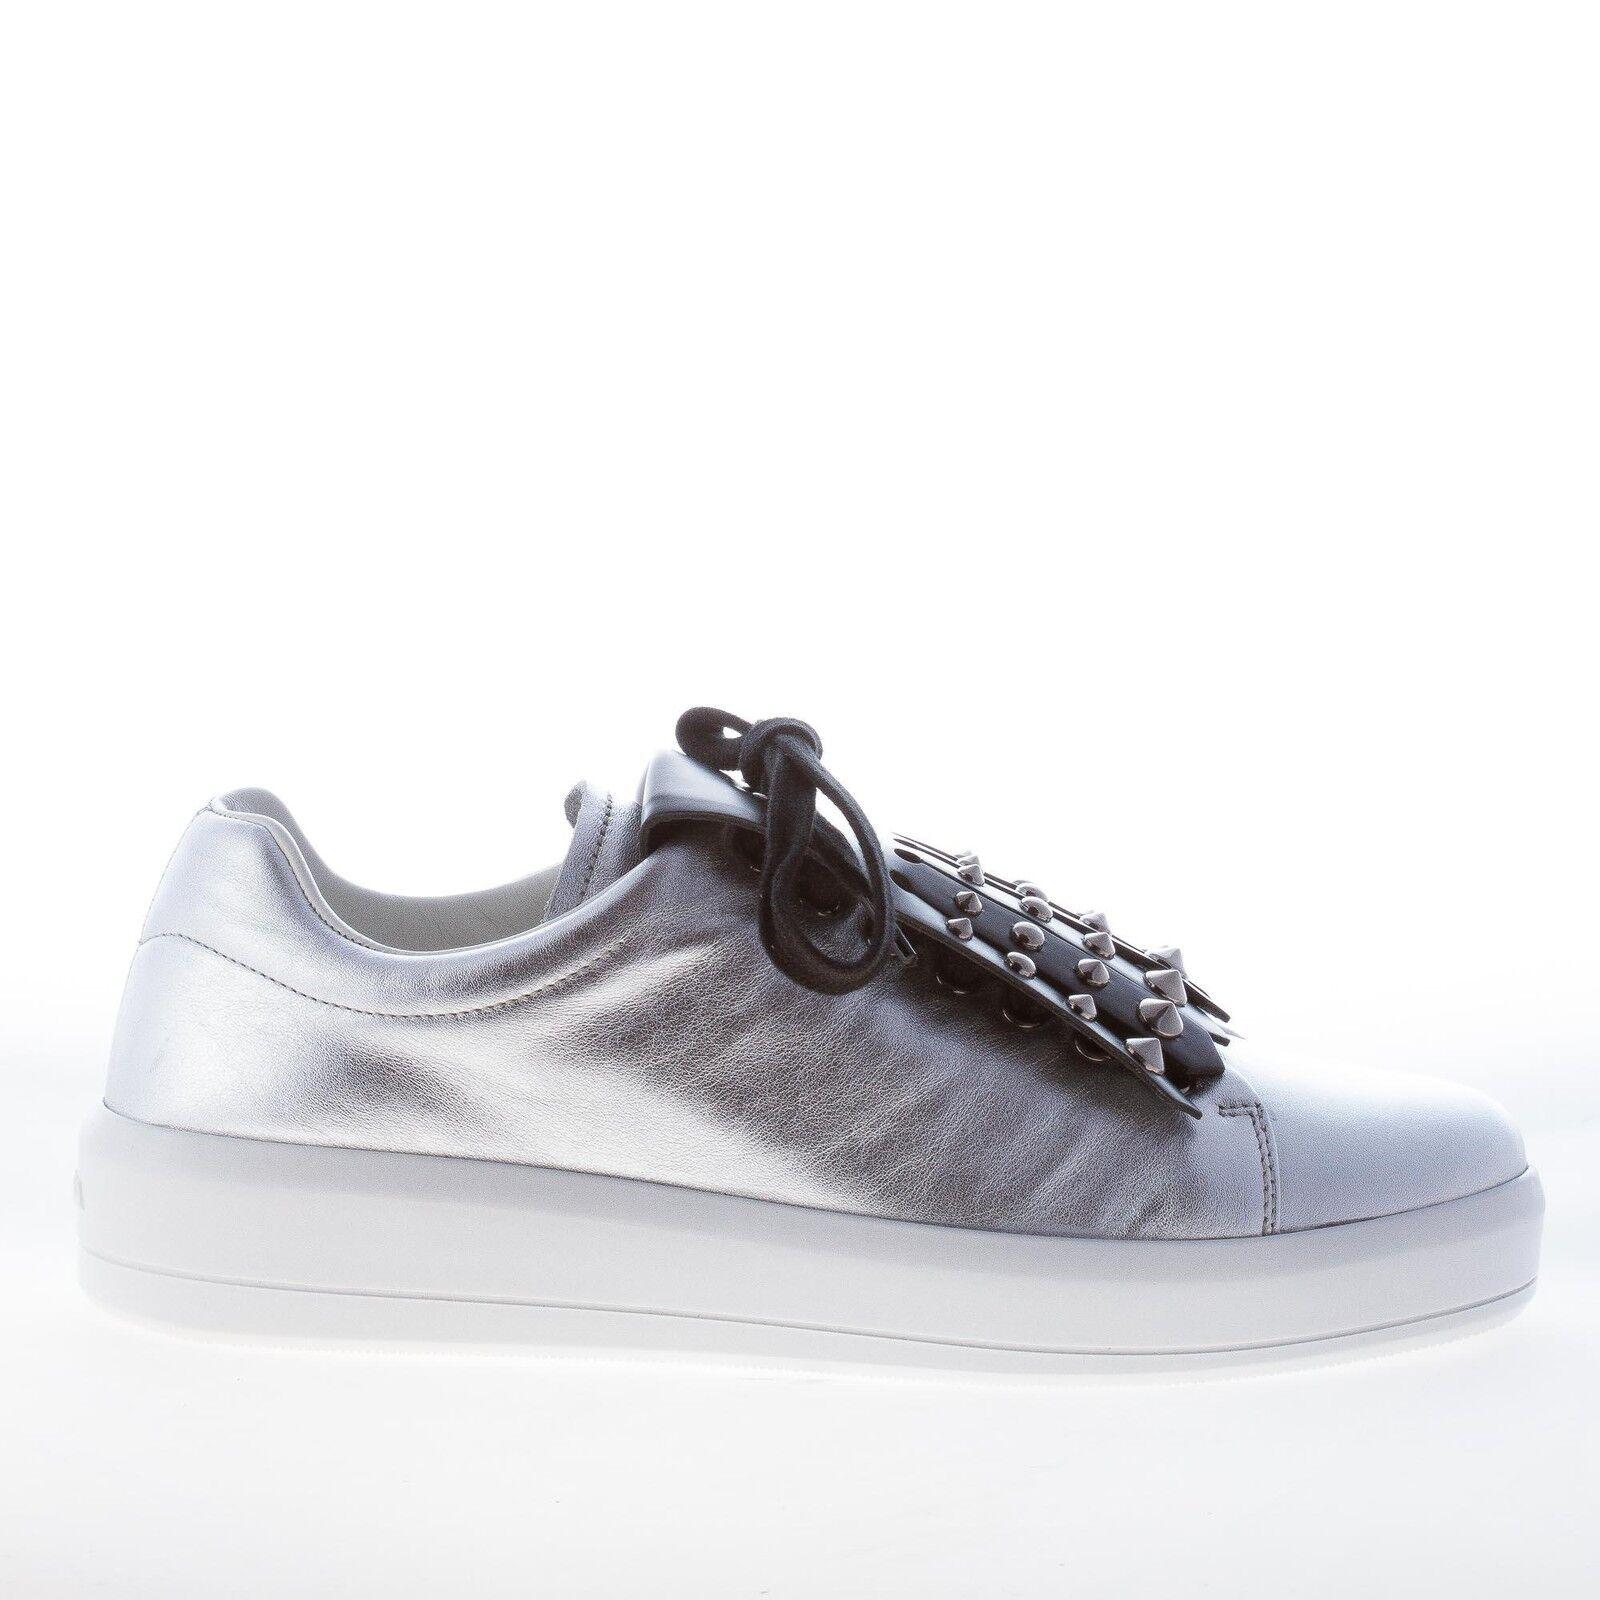 PRADA damen damen damen schuhe shoes Silver metallic leather sneaker black studs fringe b149bd